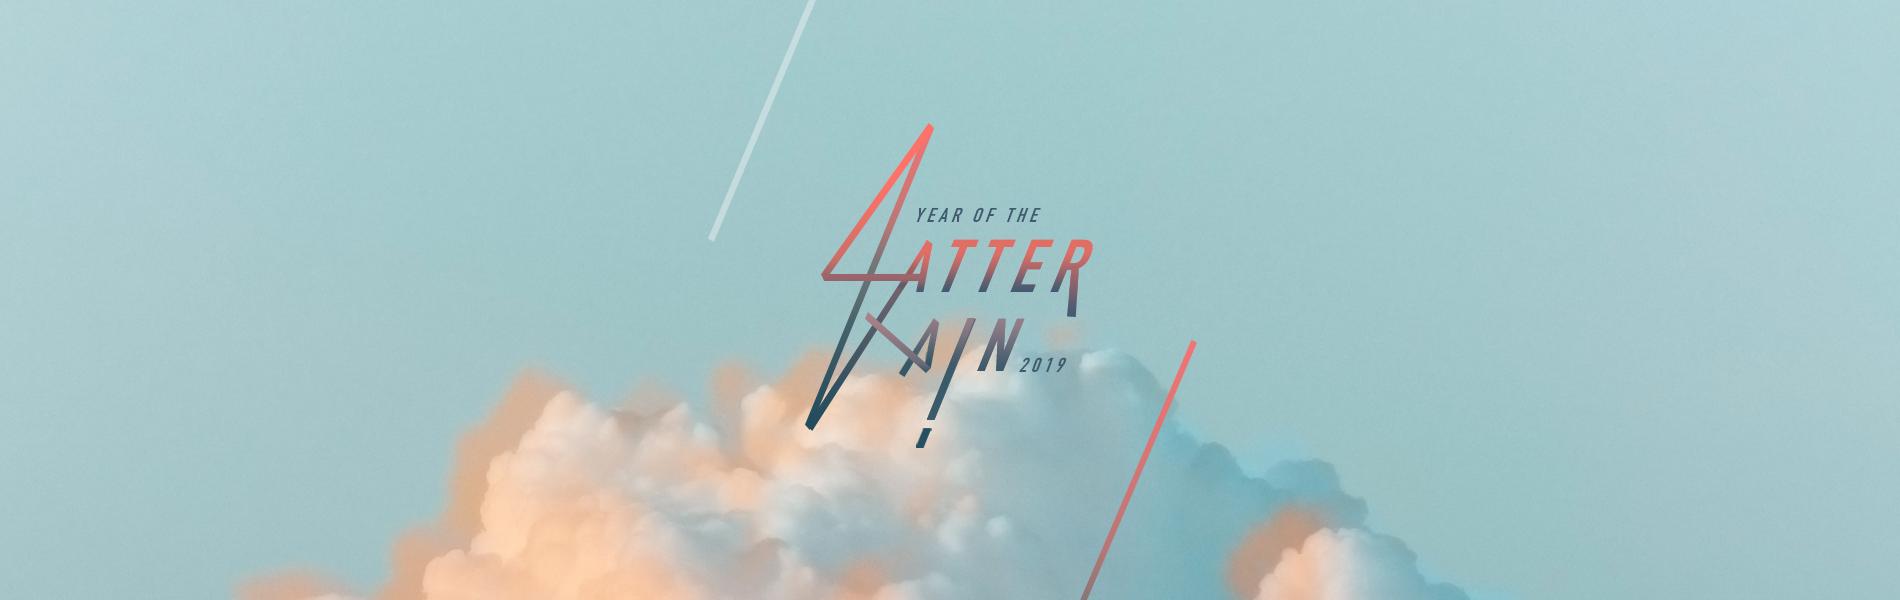 2019_02_Feb-Year-of-the-Latter-Rain_EN New Creation TV | Broadcasting the Gospel of Jesus